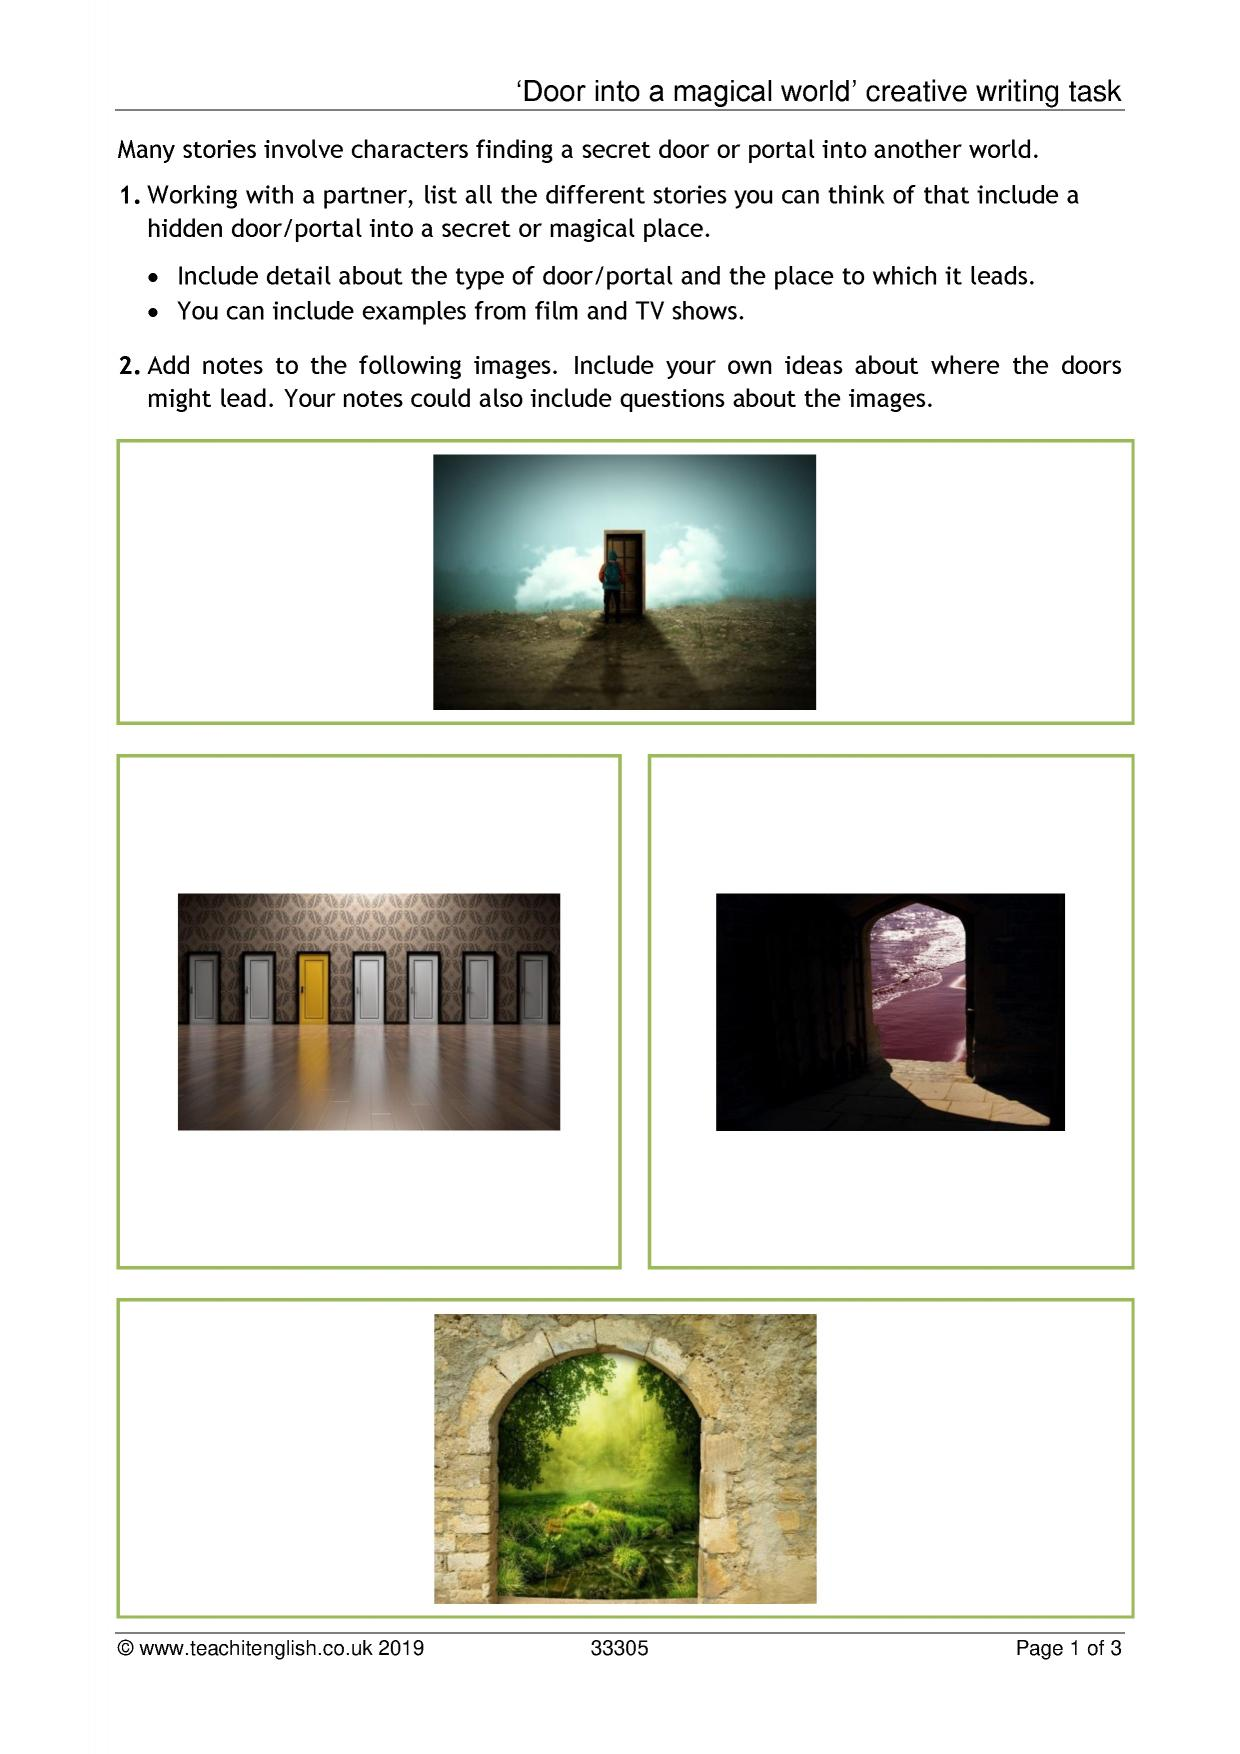 KS3 writing resources for English teachers - Teachit English